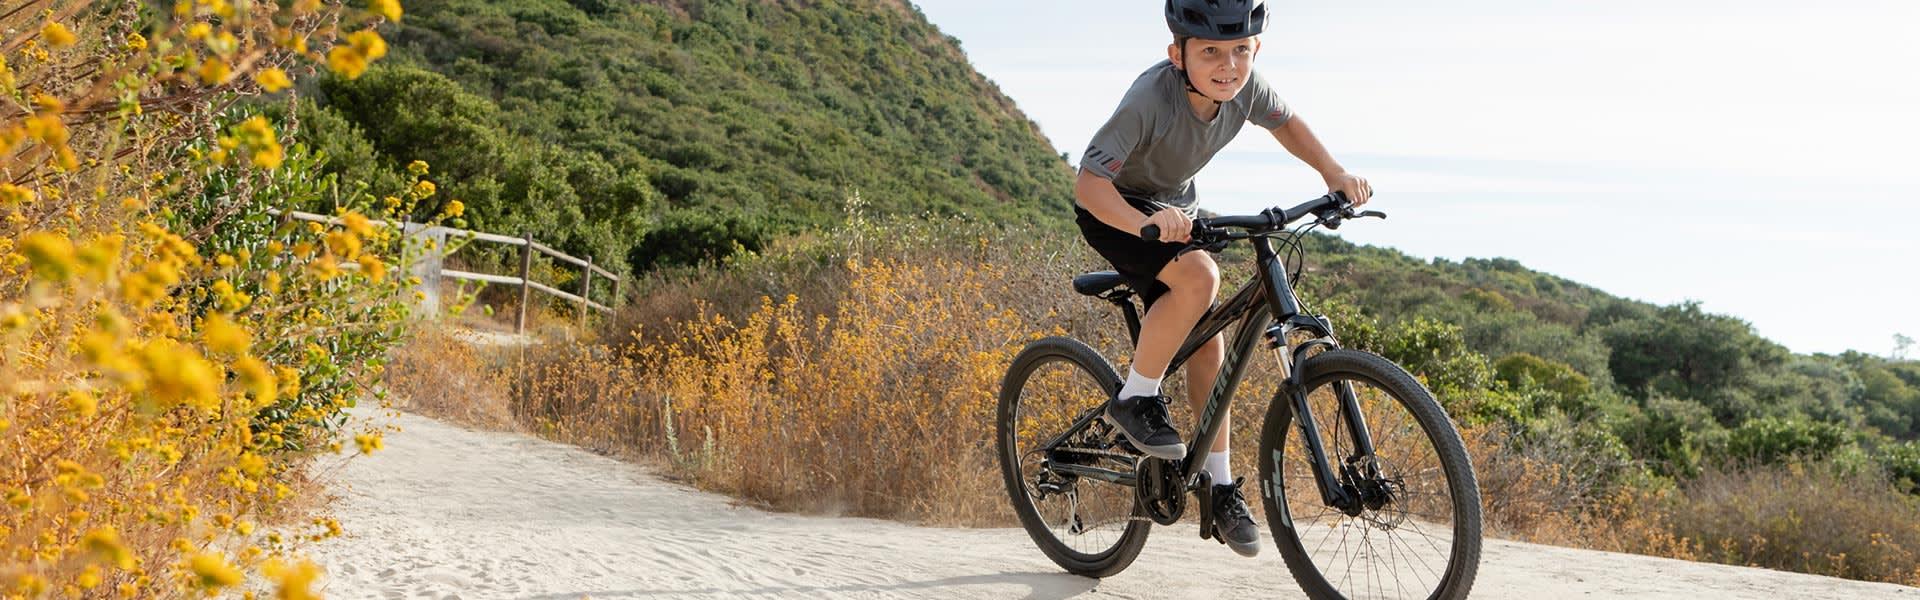 ARX 24 (2020) | Herren Youth Cruisers Fahrrad | Giant